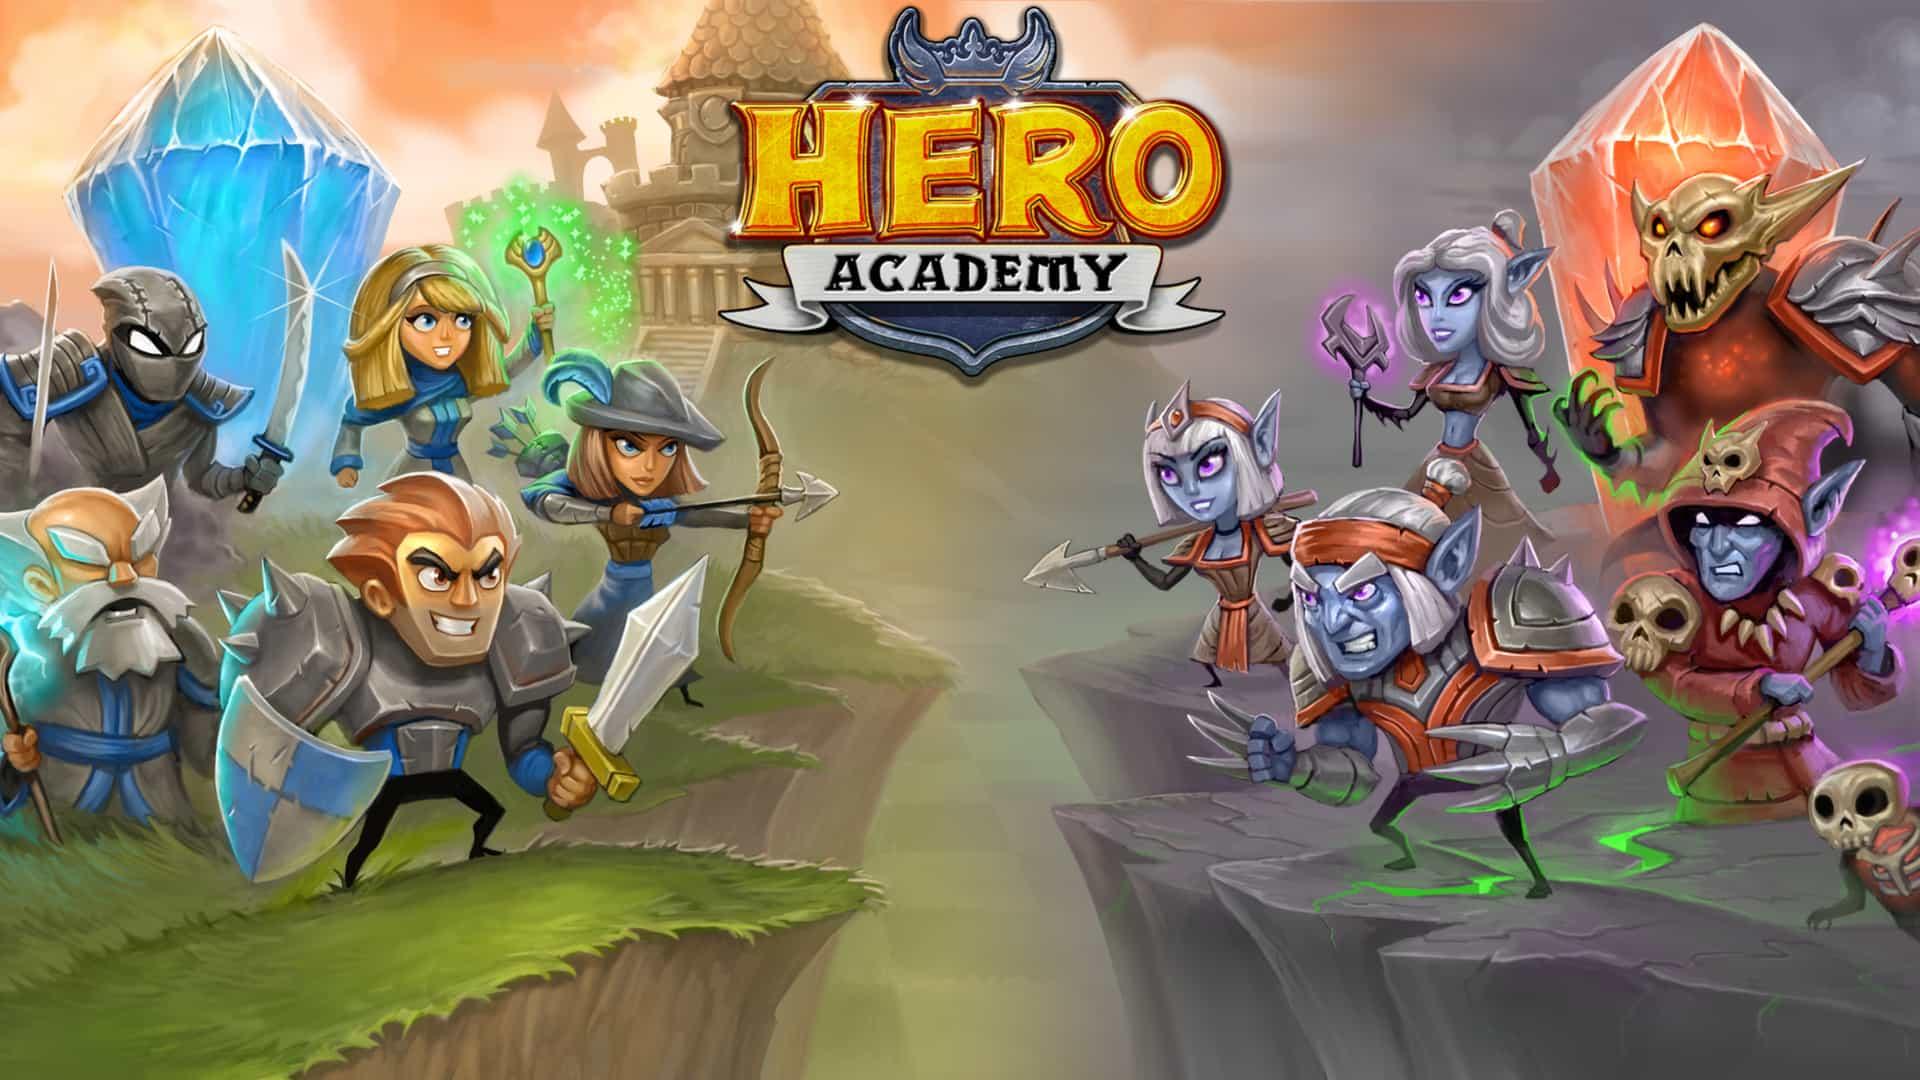 aplicativo hero academy para ios